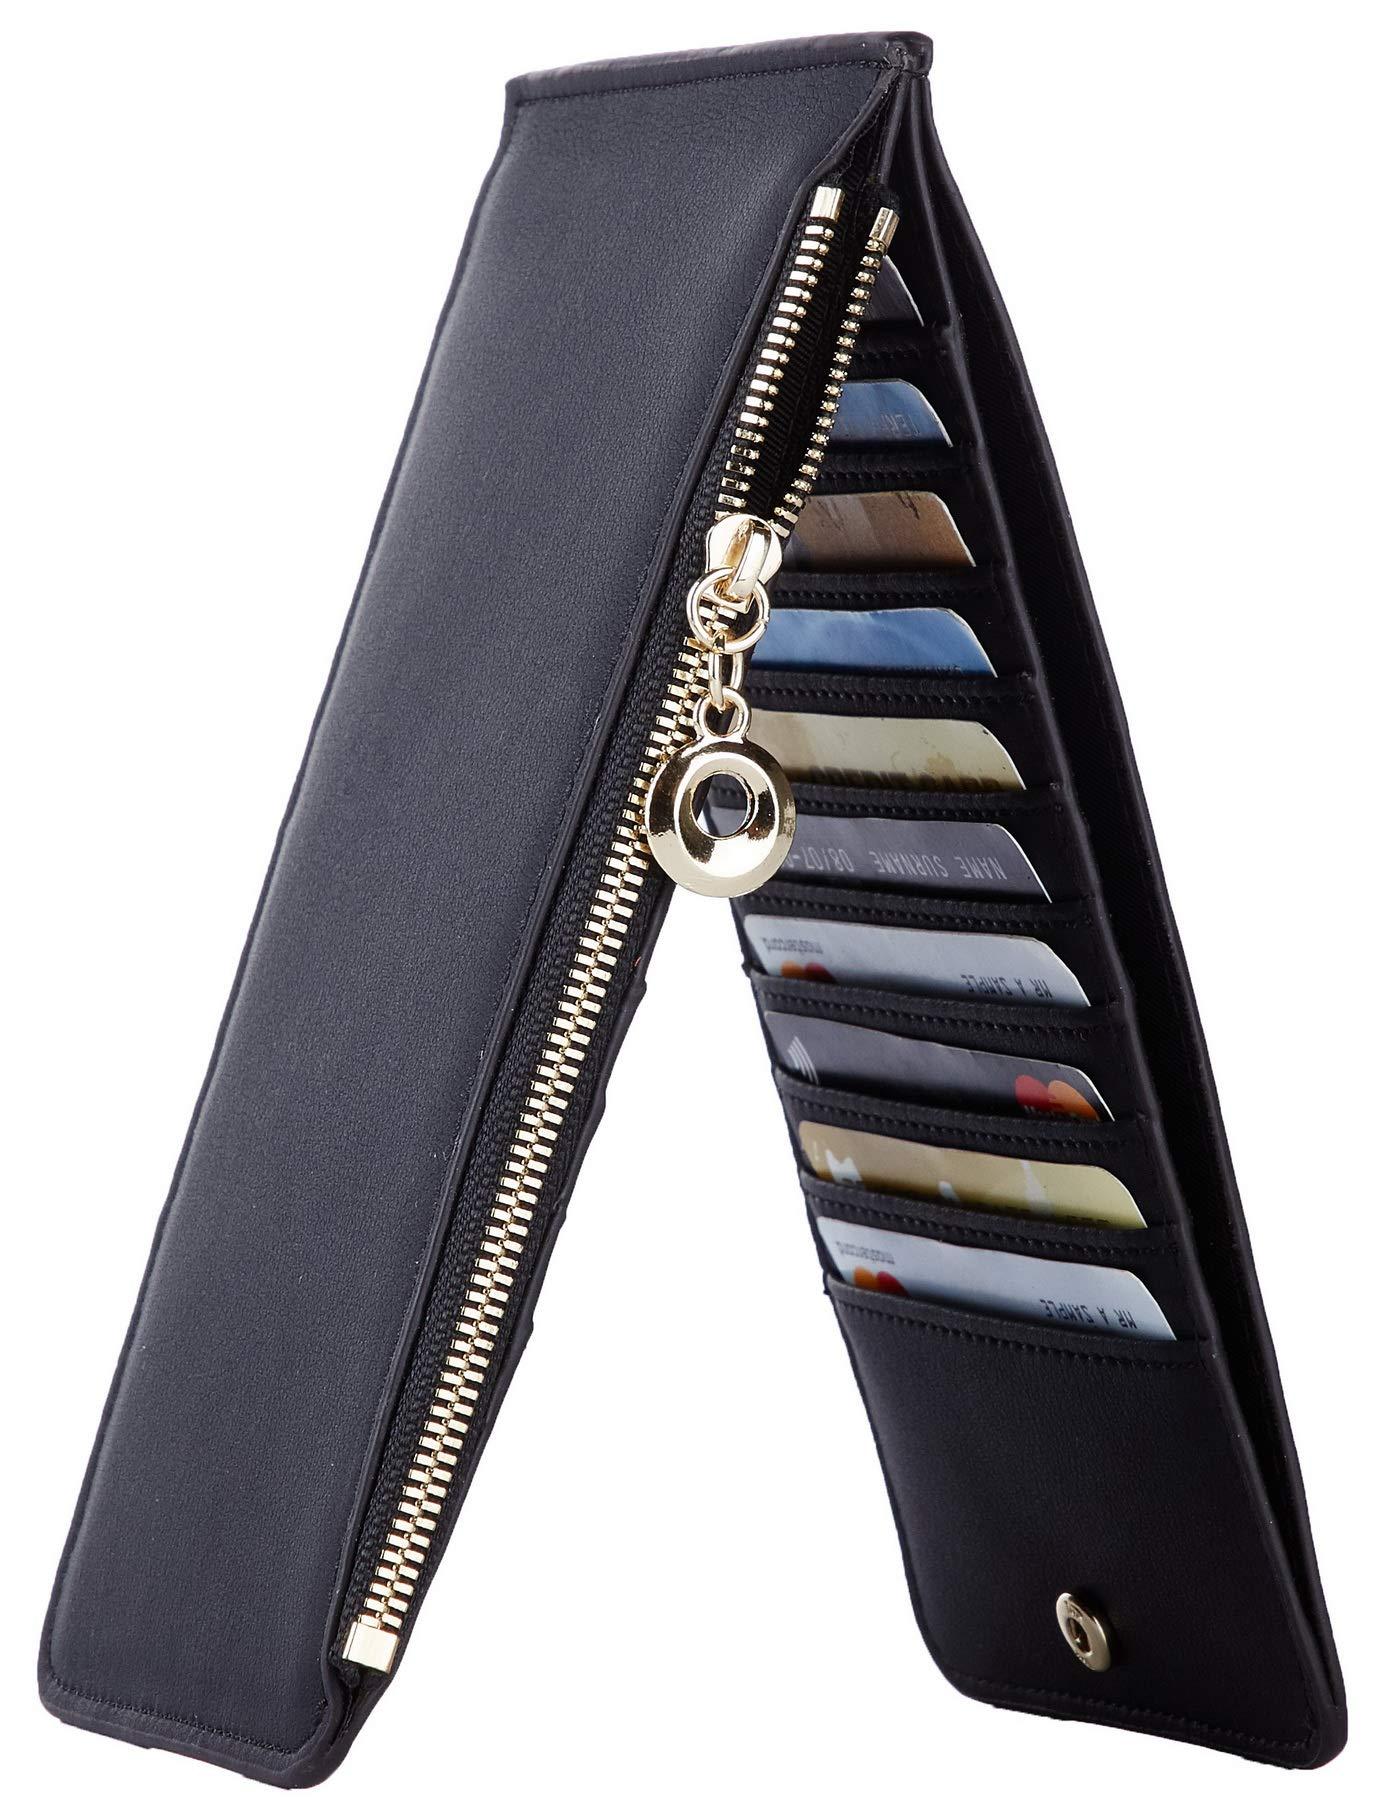 Toughergun Womens RFID Blocking Genuine Leather Multi Card Organizer Wallet with Zipper Pocket(Chic Black) by Toughergun